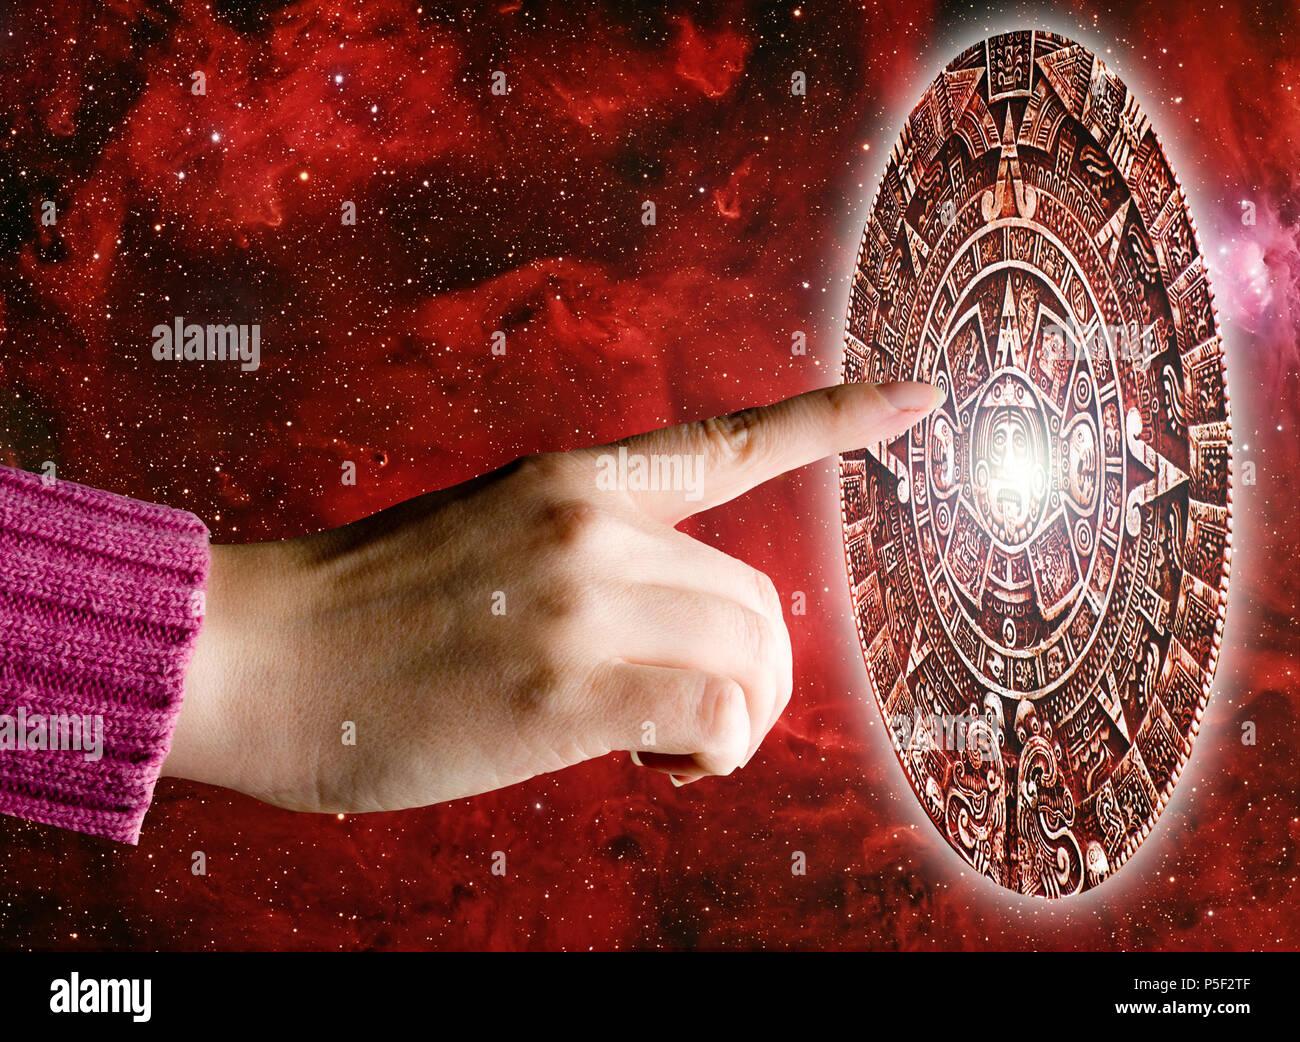 hand touching the Aztec stone calendar - Stock Image